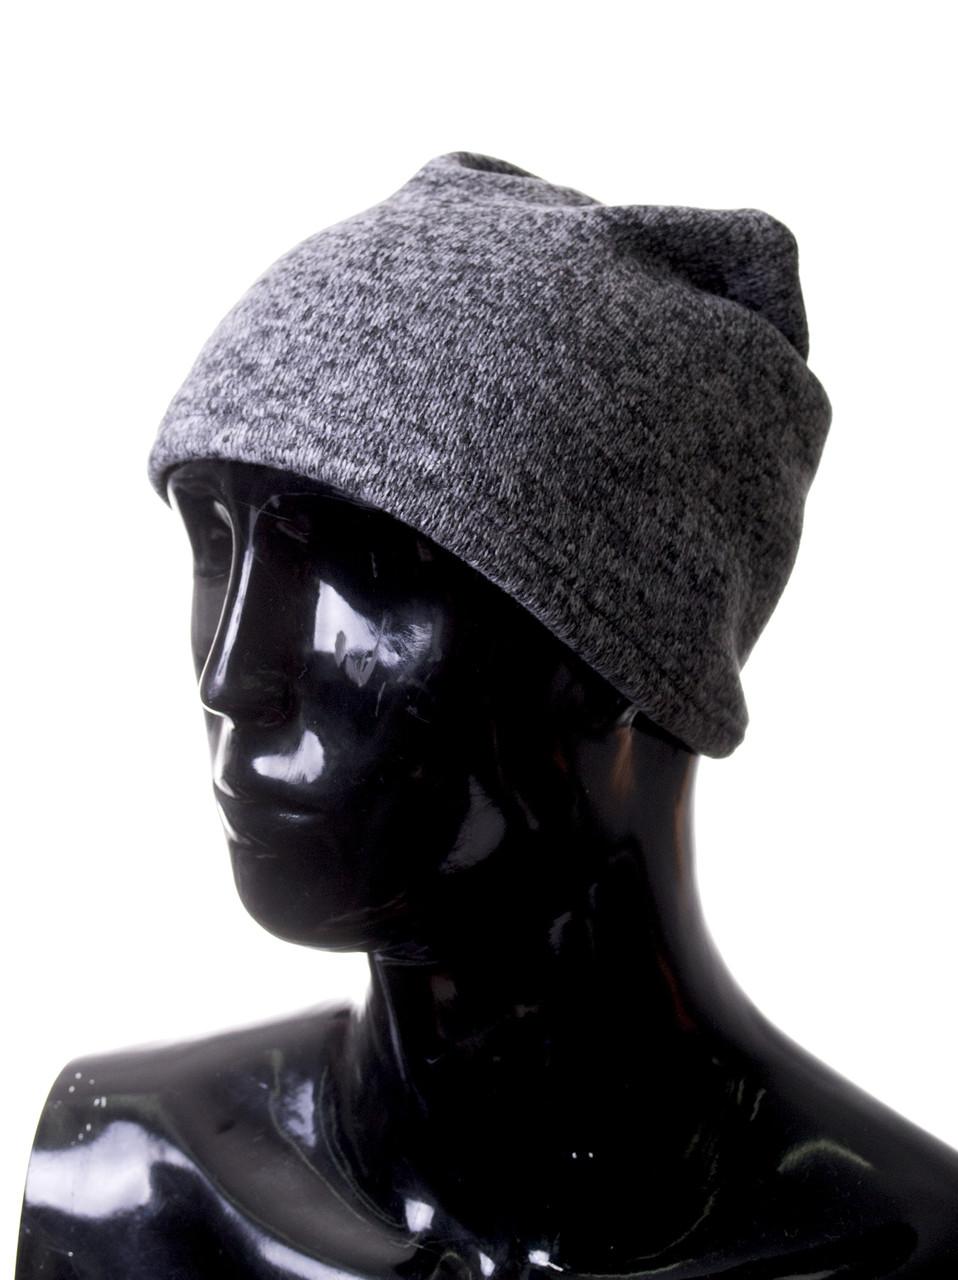 Шапка Echt Gloves One size Серый E1ton l-grey, КОД: 194361